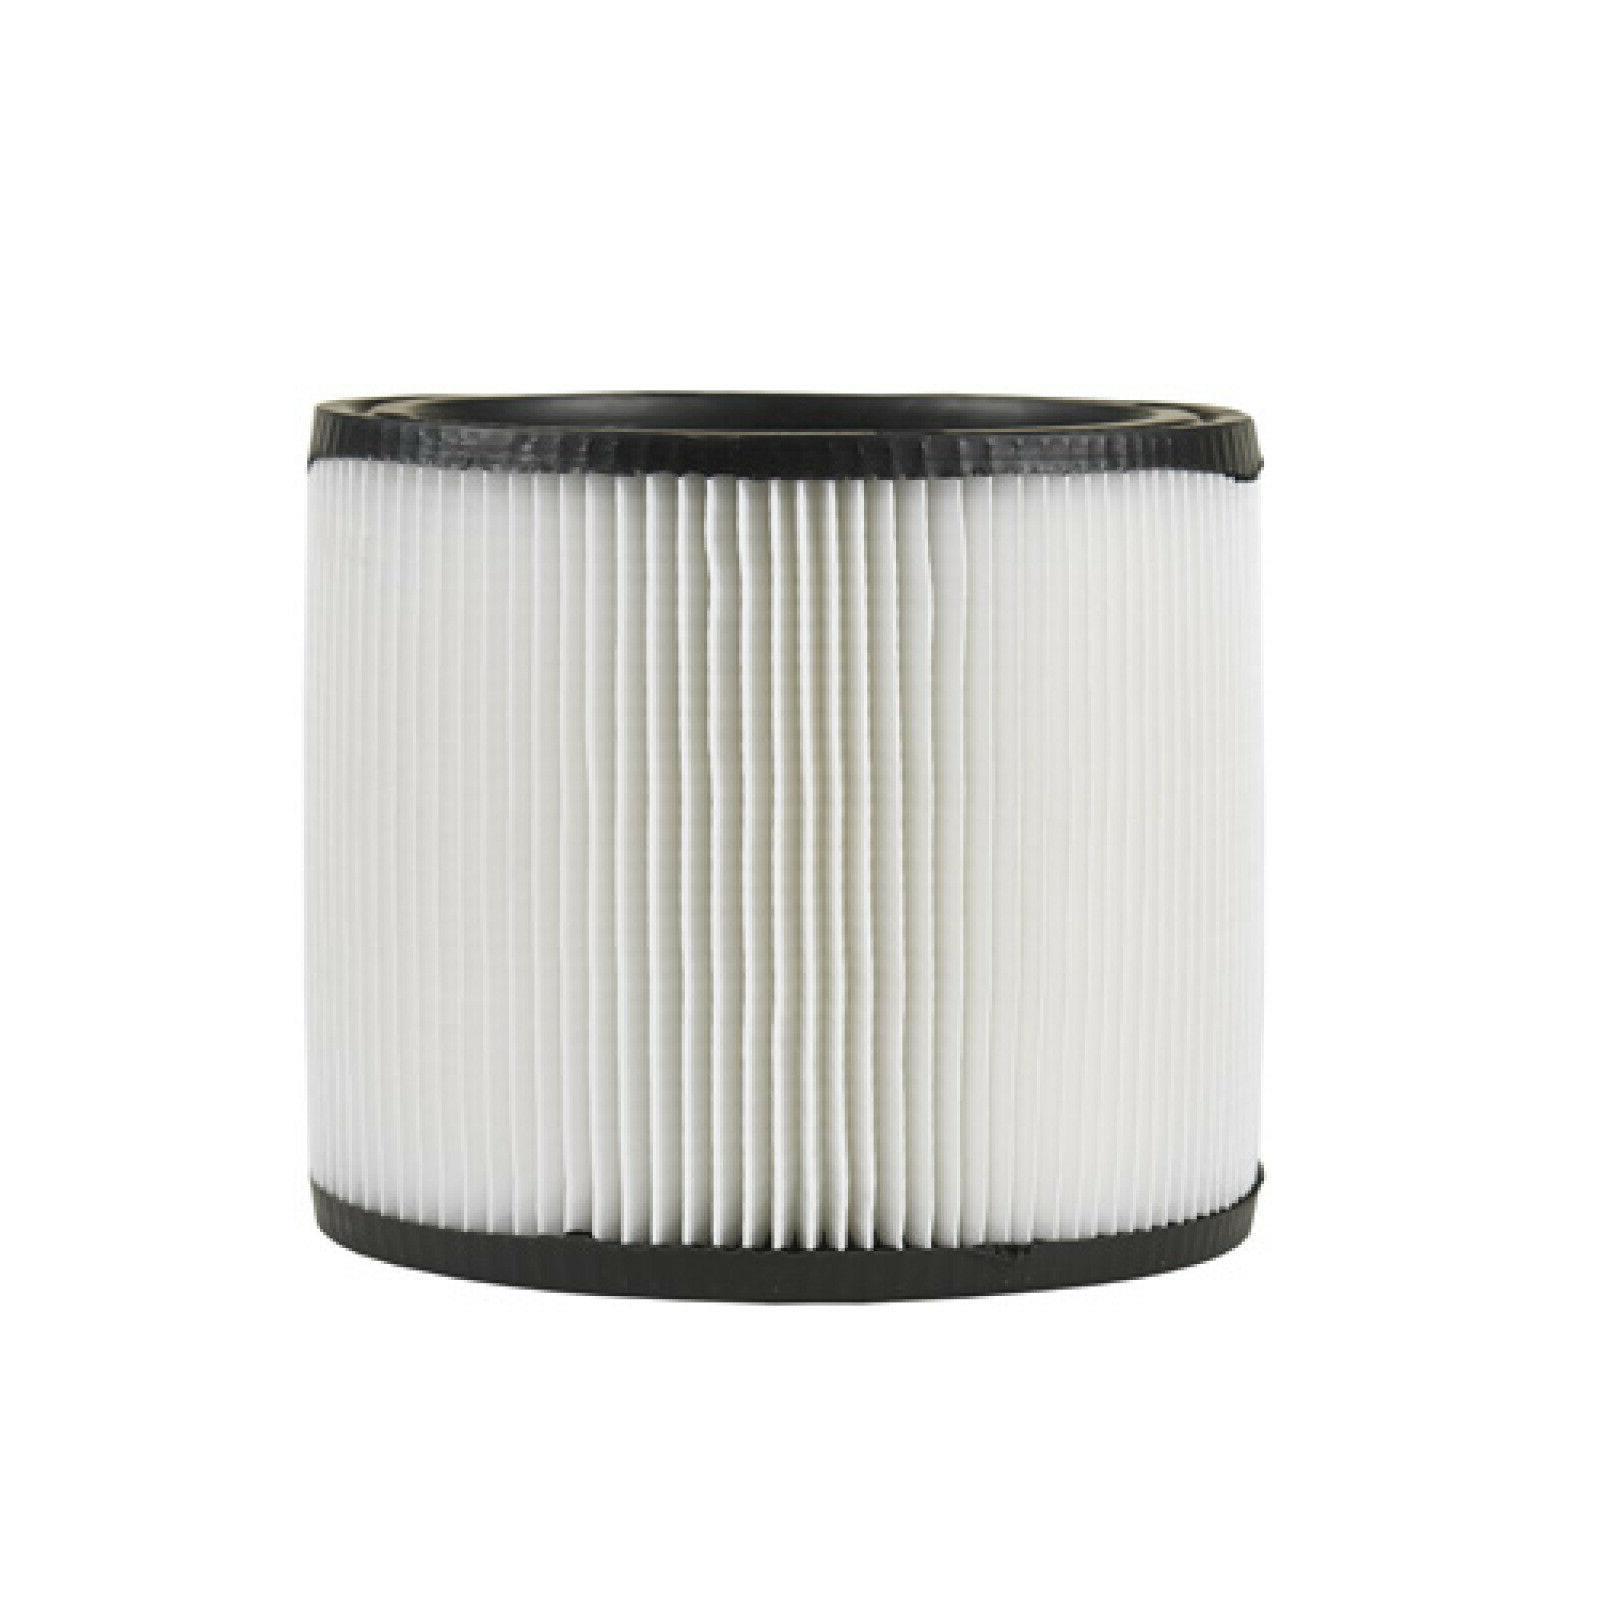 Shop-Vac 5 Gallon Capacity Type Large Cartridge Filter